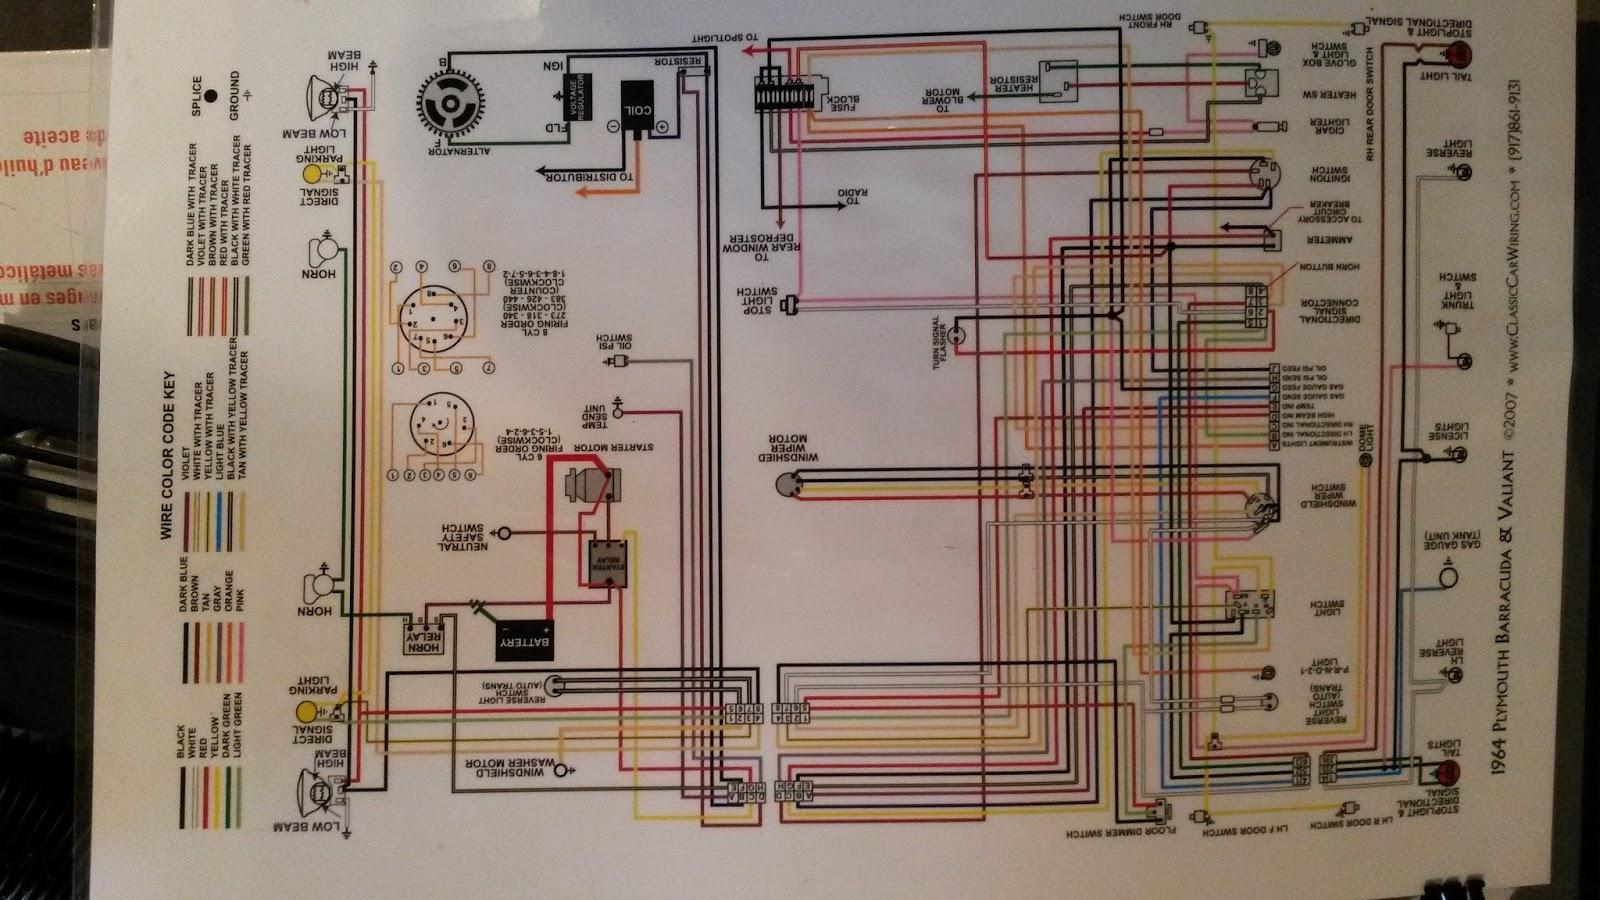 hight resolution of 1967 barracuda wiring diagram wiring diagram gpwrg 7489 wiring diagram 1967 belvedere 1967 barracuda wiring